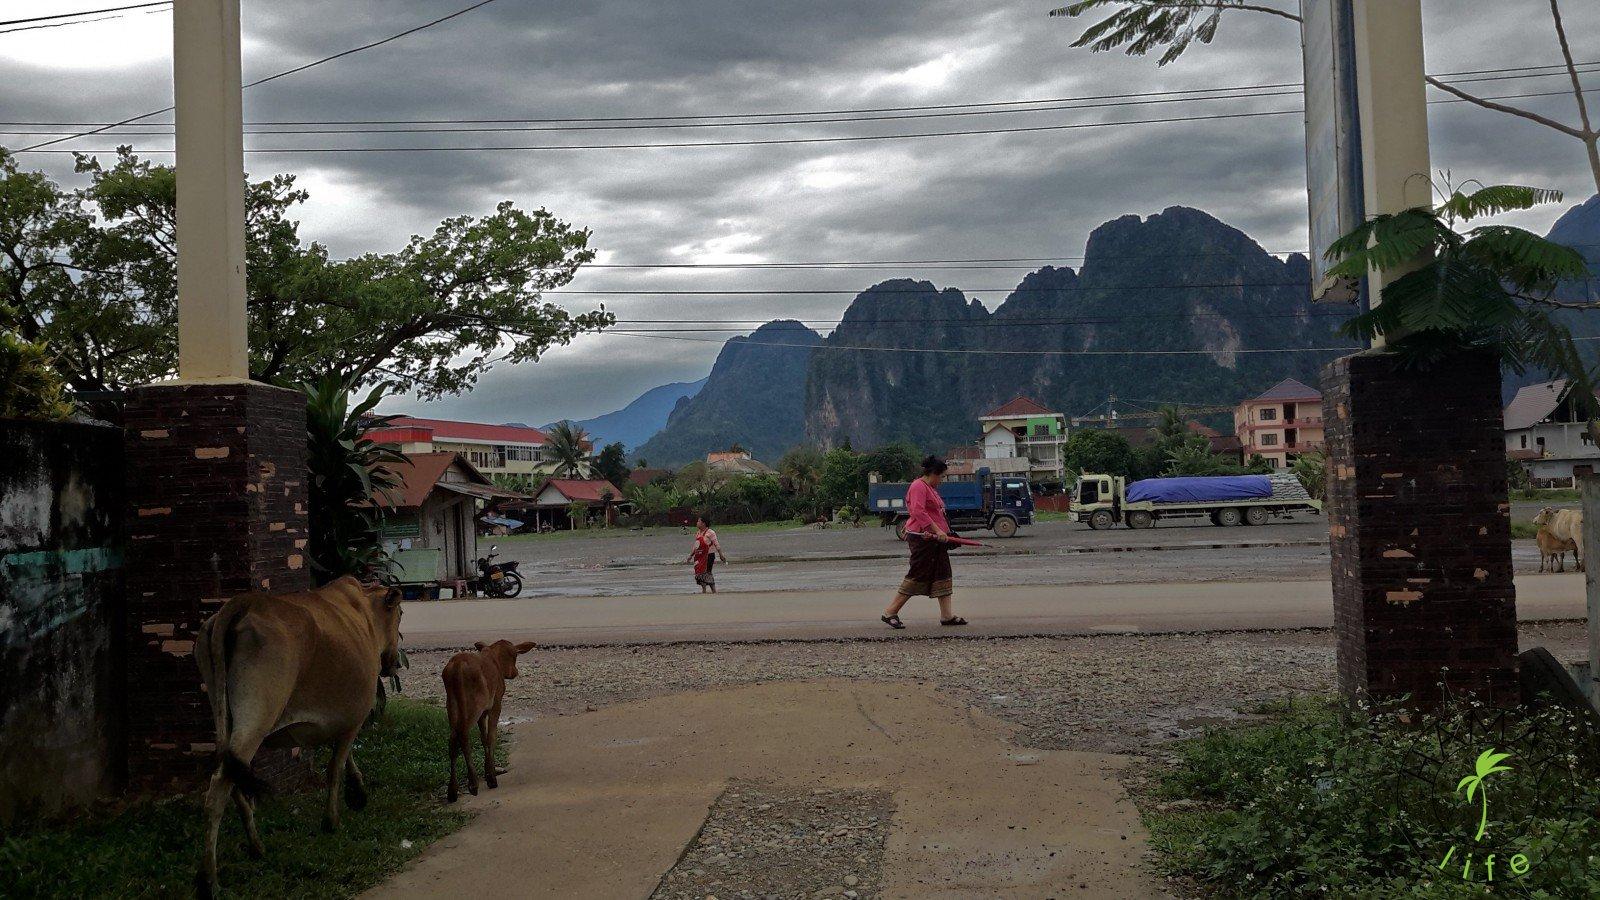 Laos 2015, Vang Vieng